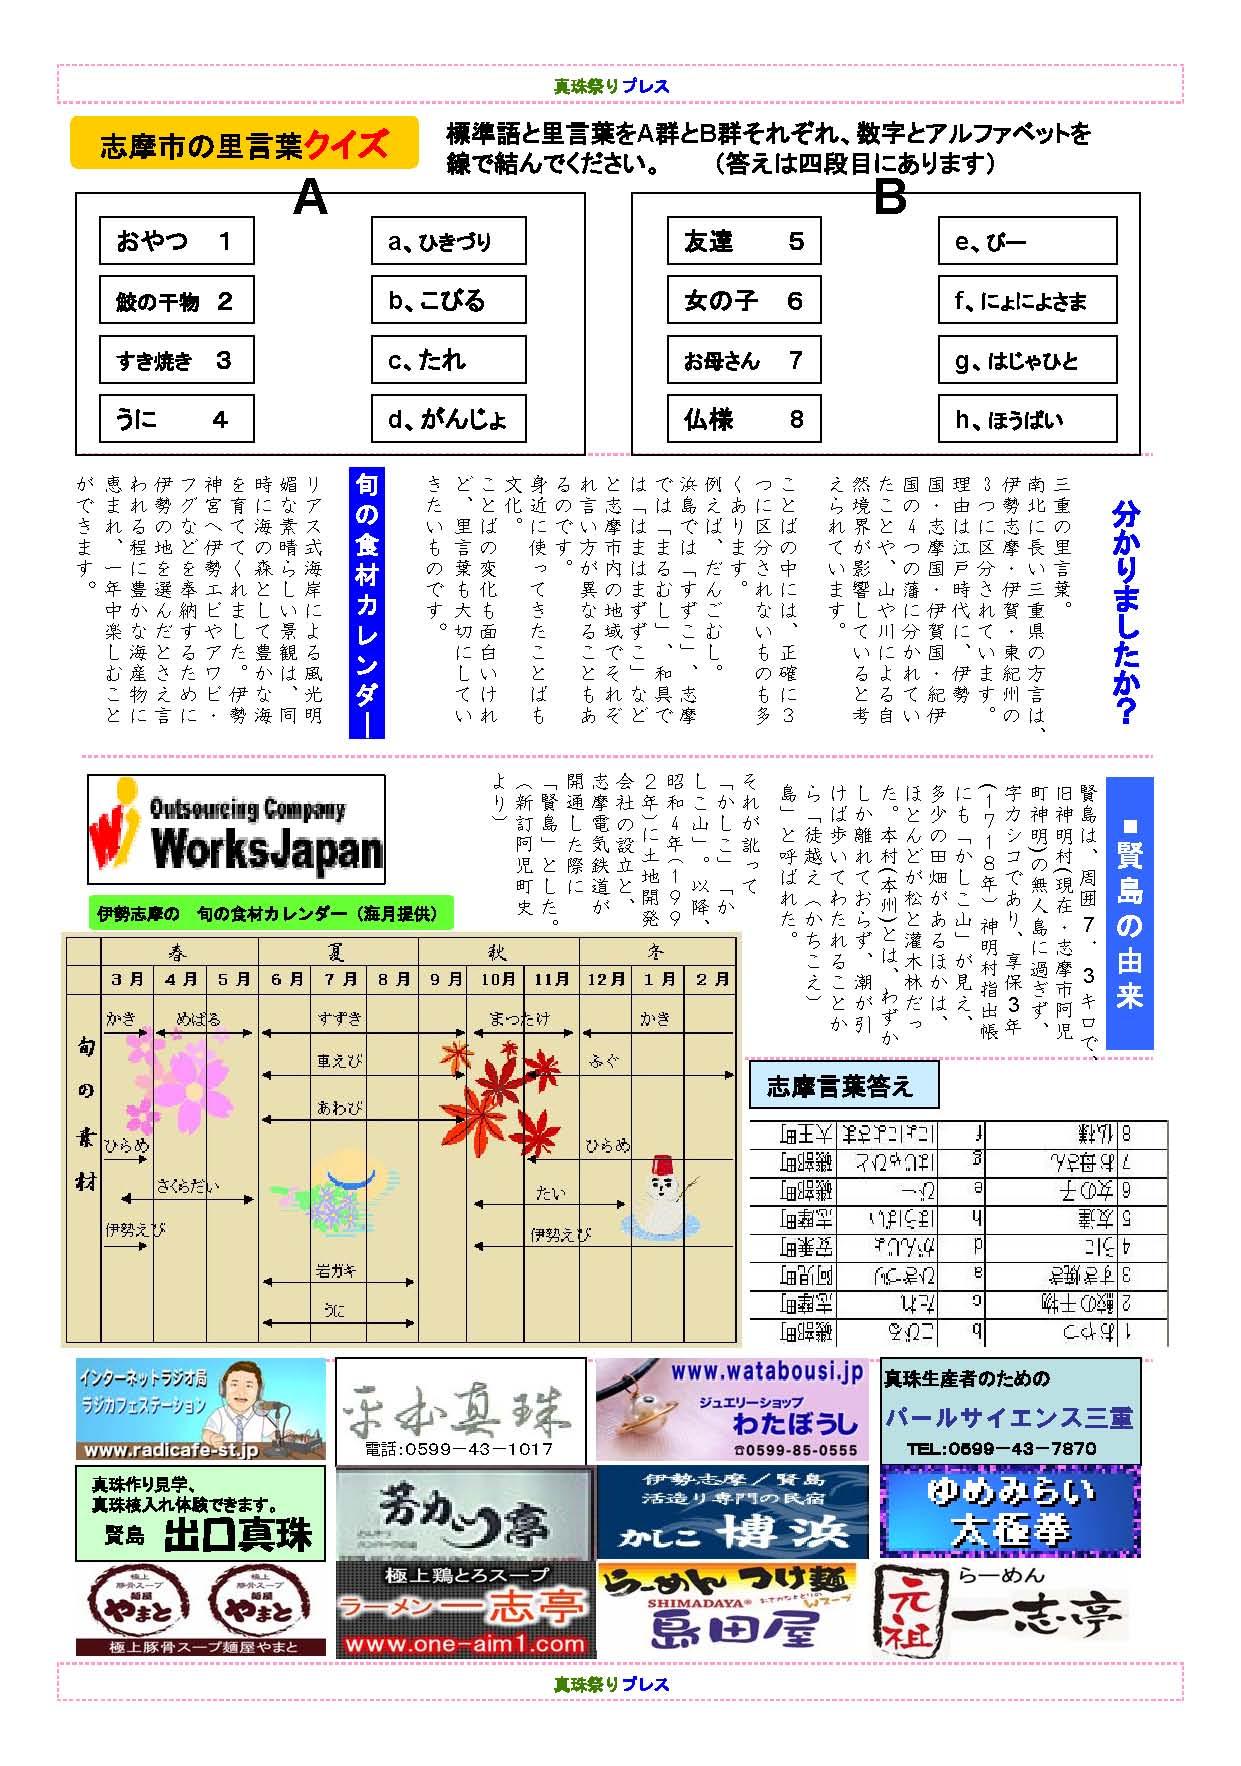 http://iseshima.org/sinjyu_3.jpg